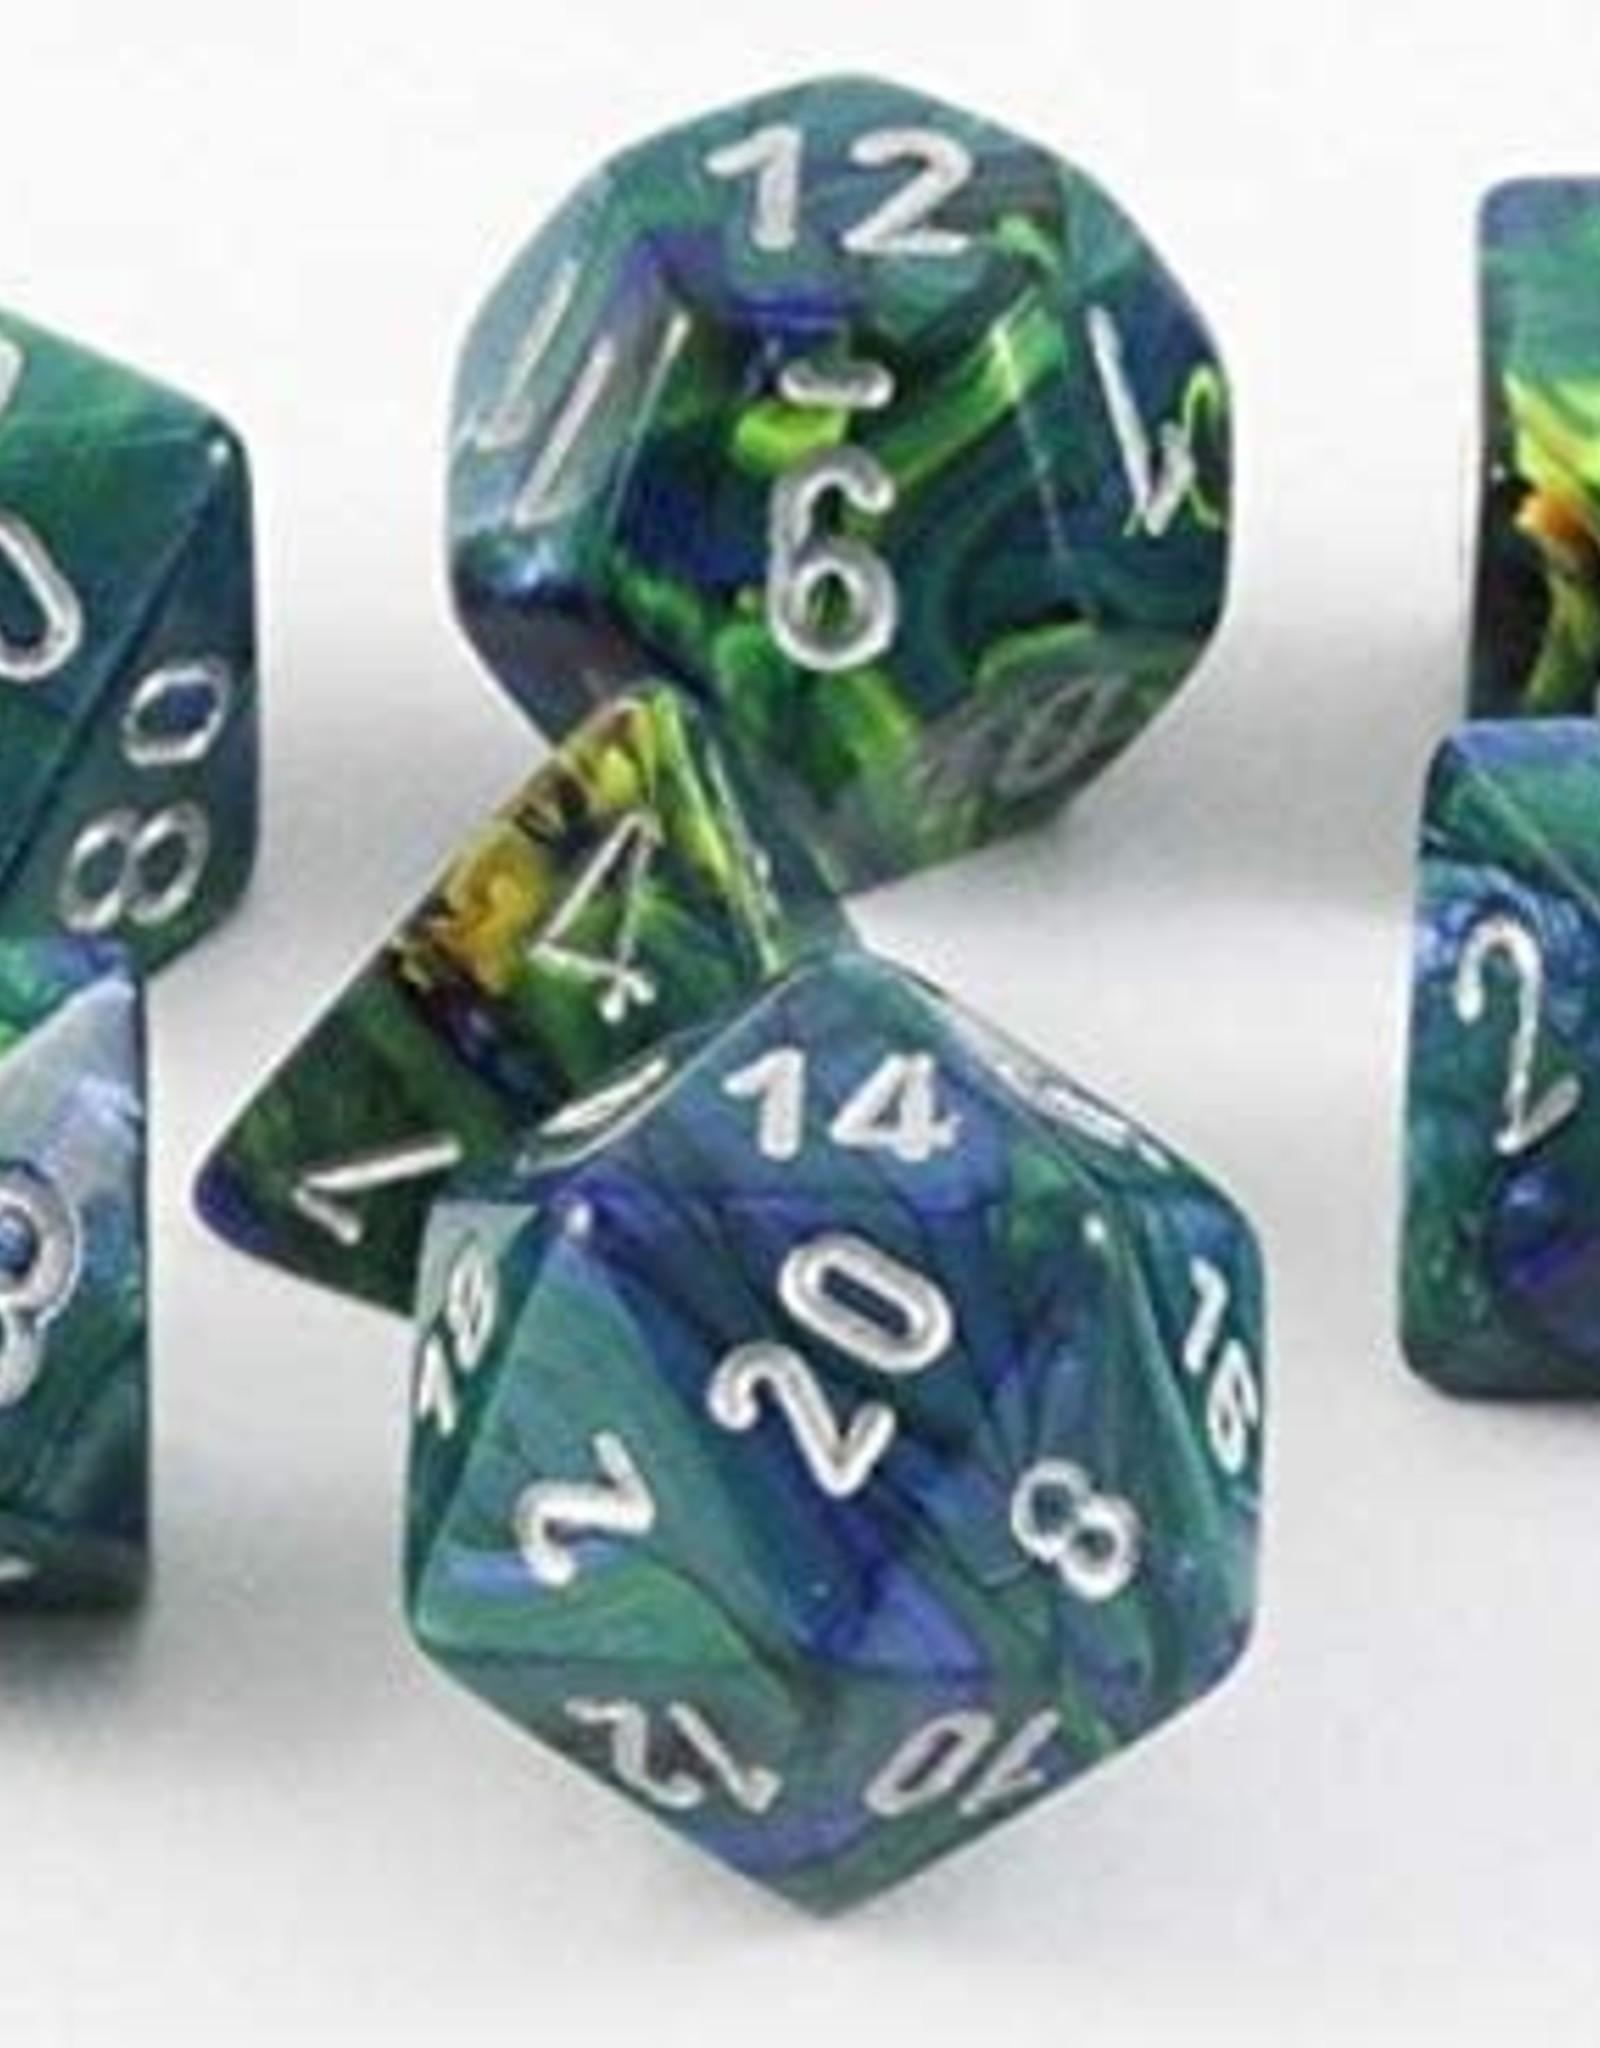 Chessex Festive Poly 7 set : Green w/ Silver